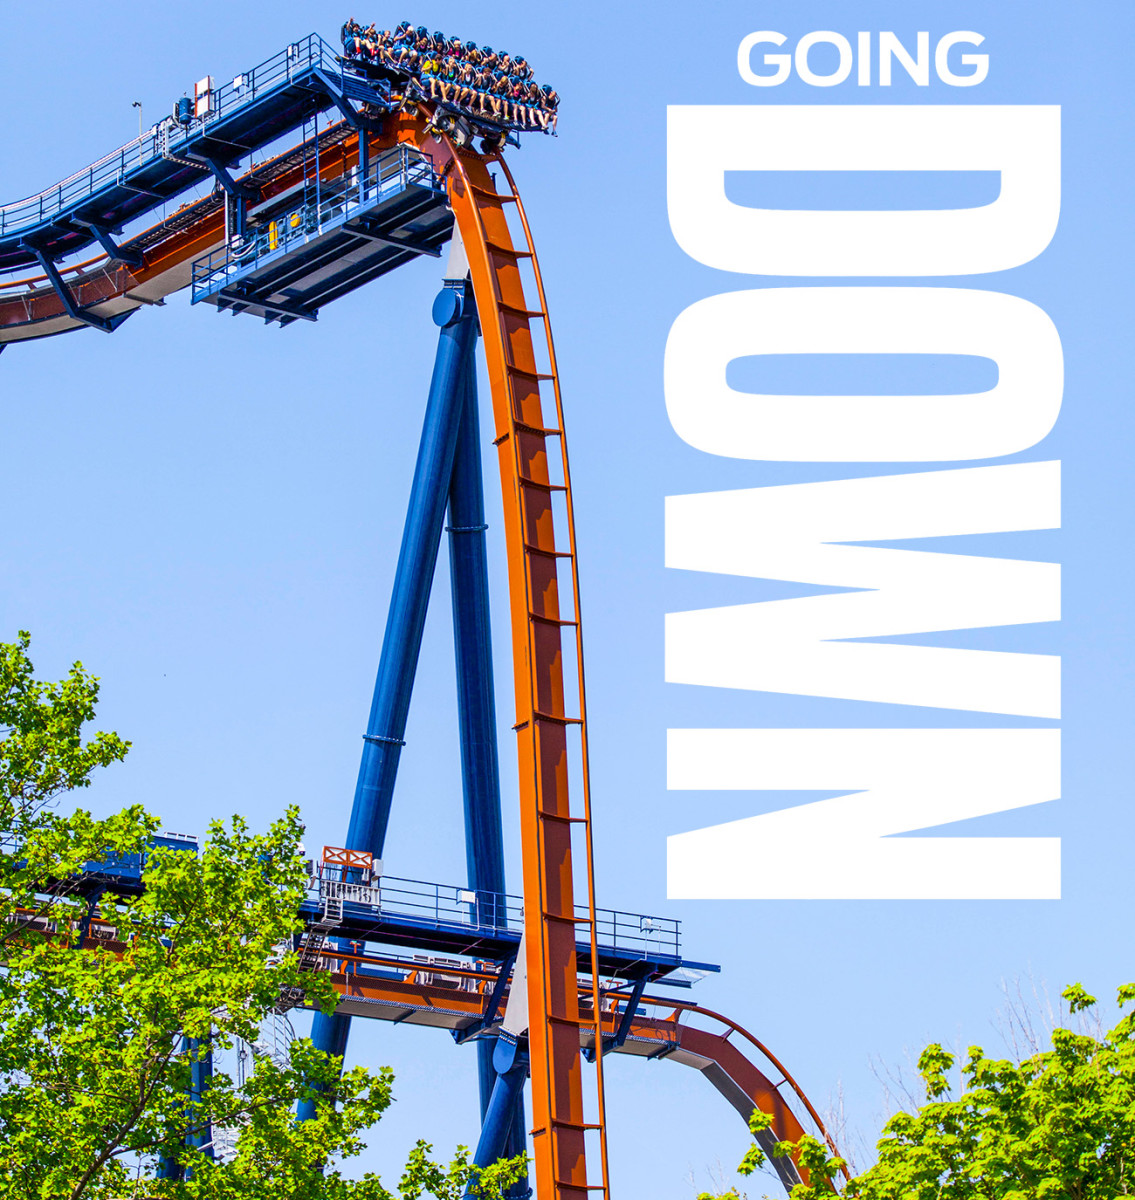 rollercoaster-cedar-point-article1.jpg